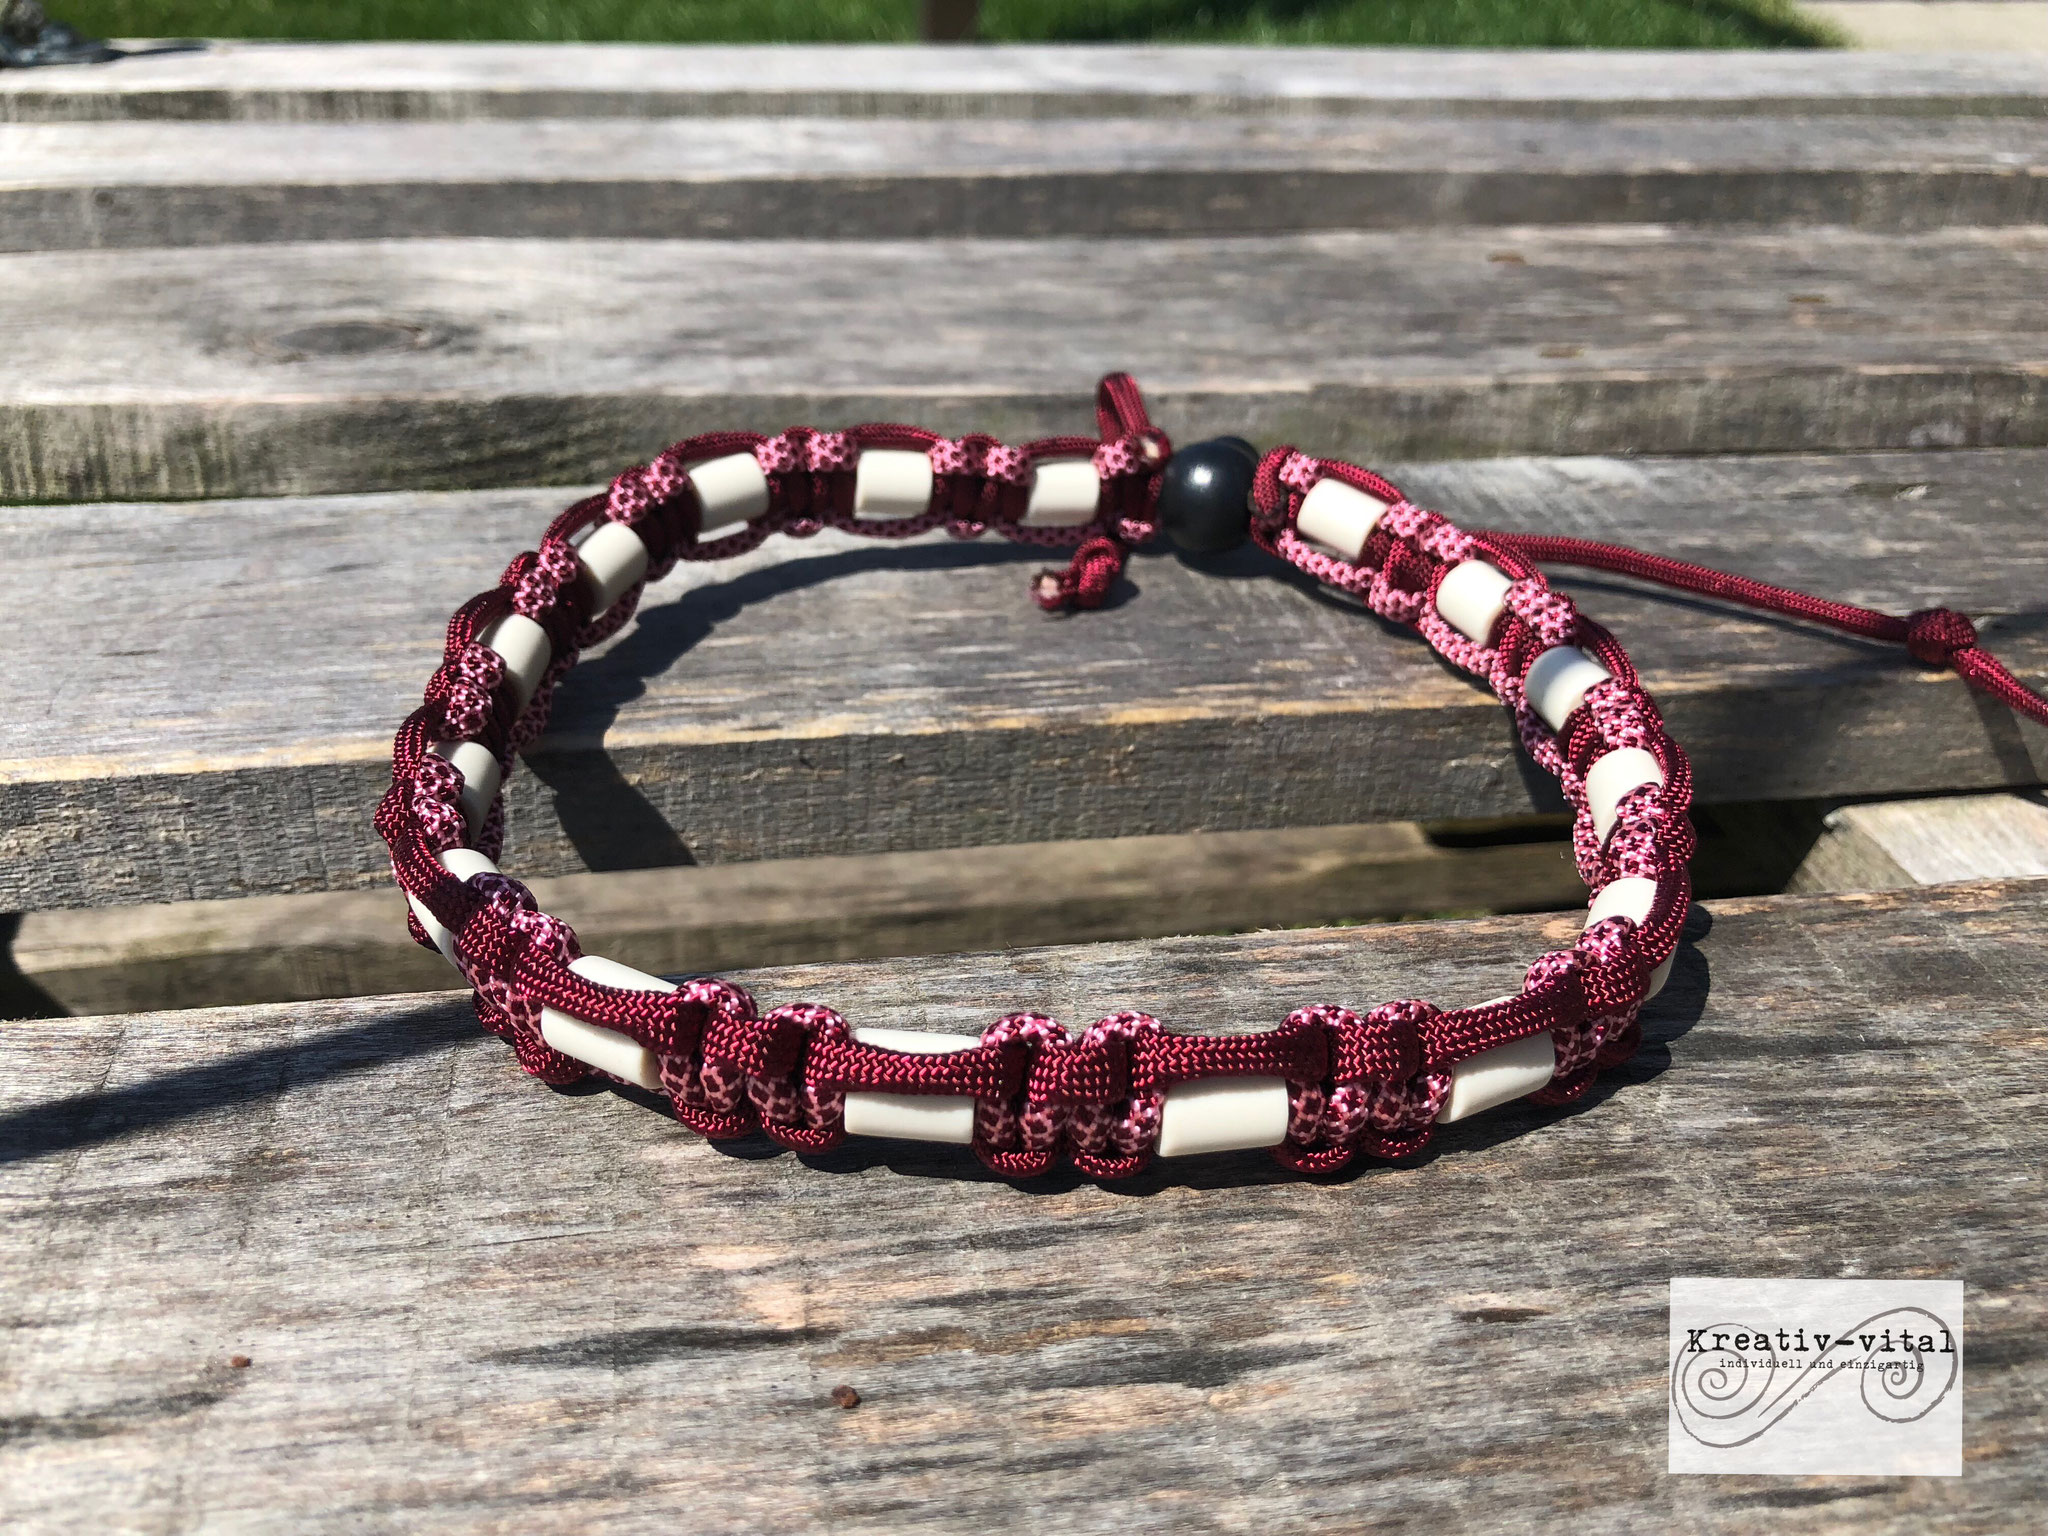 EM Keramik Halsband für Hund/Katze 46-50cm Halsumfang